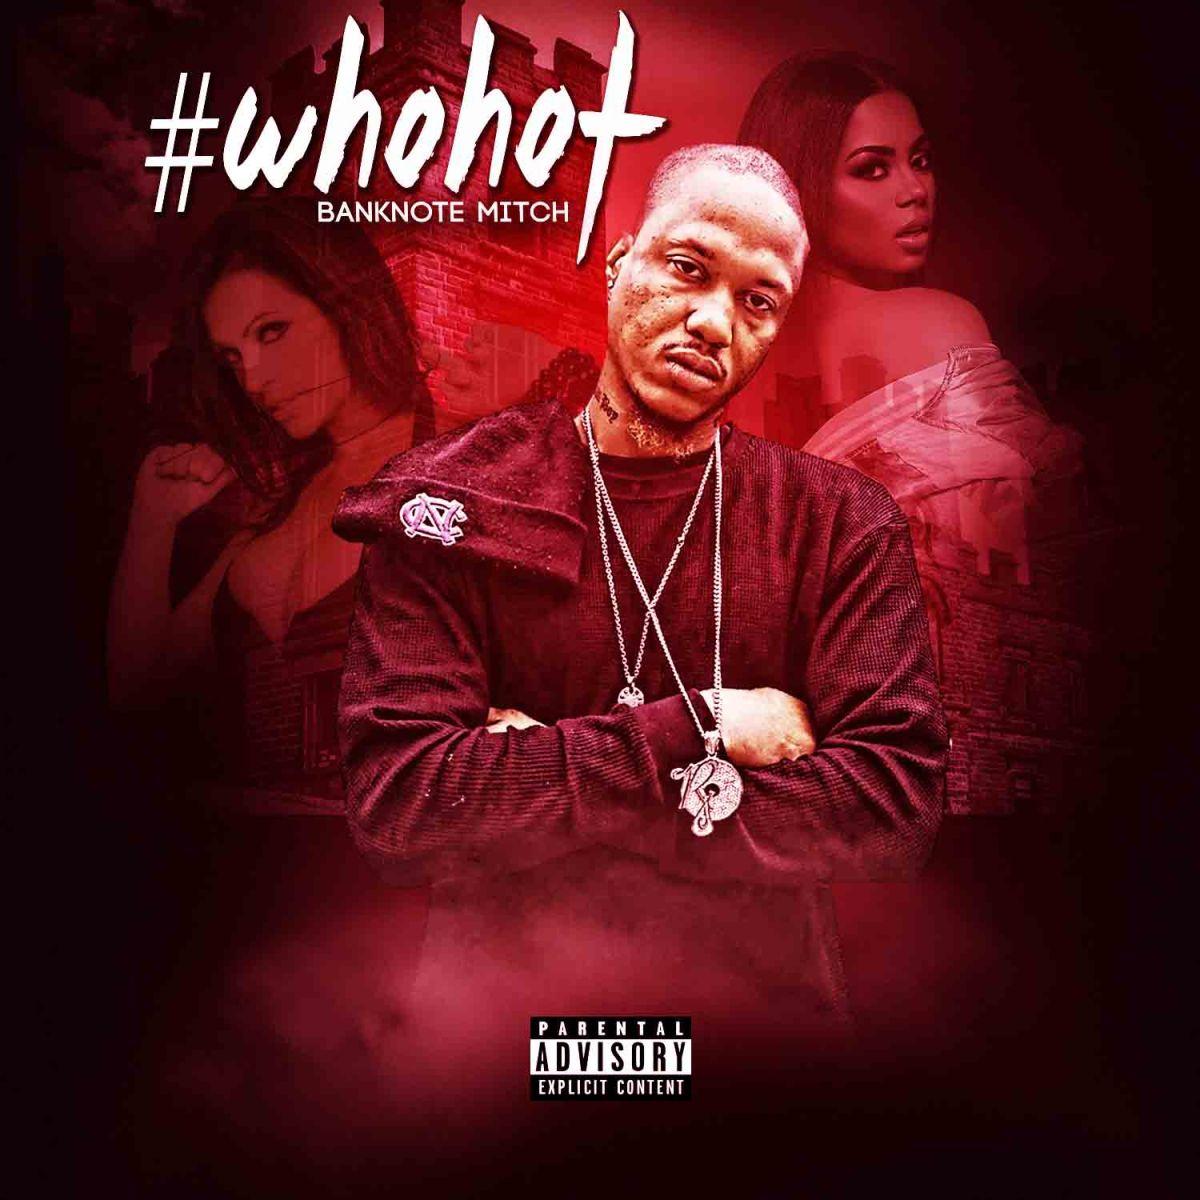 Banknote Mitch - #WhoHot